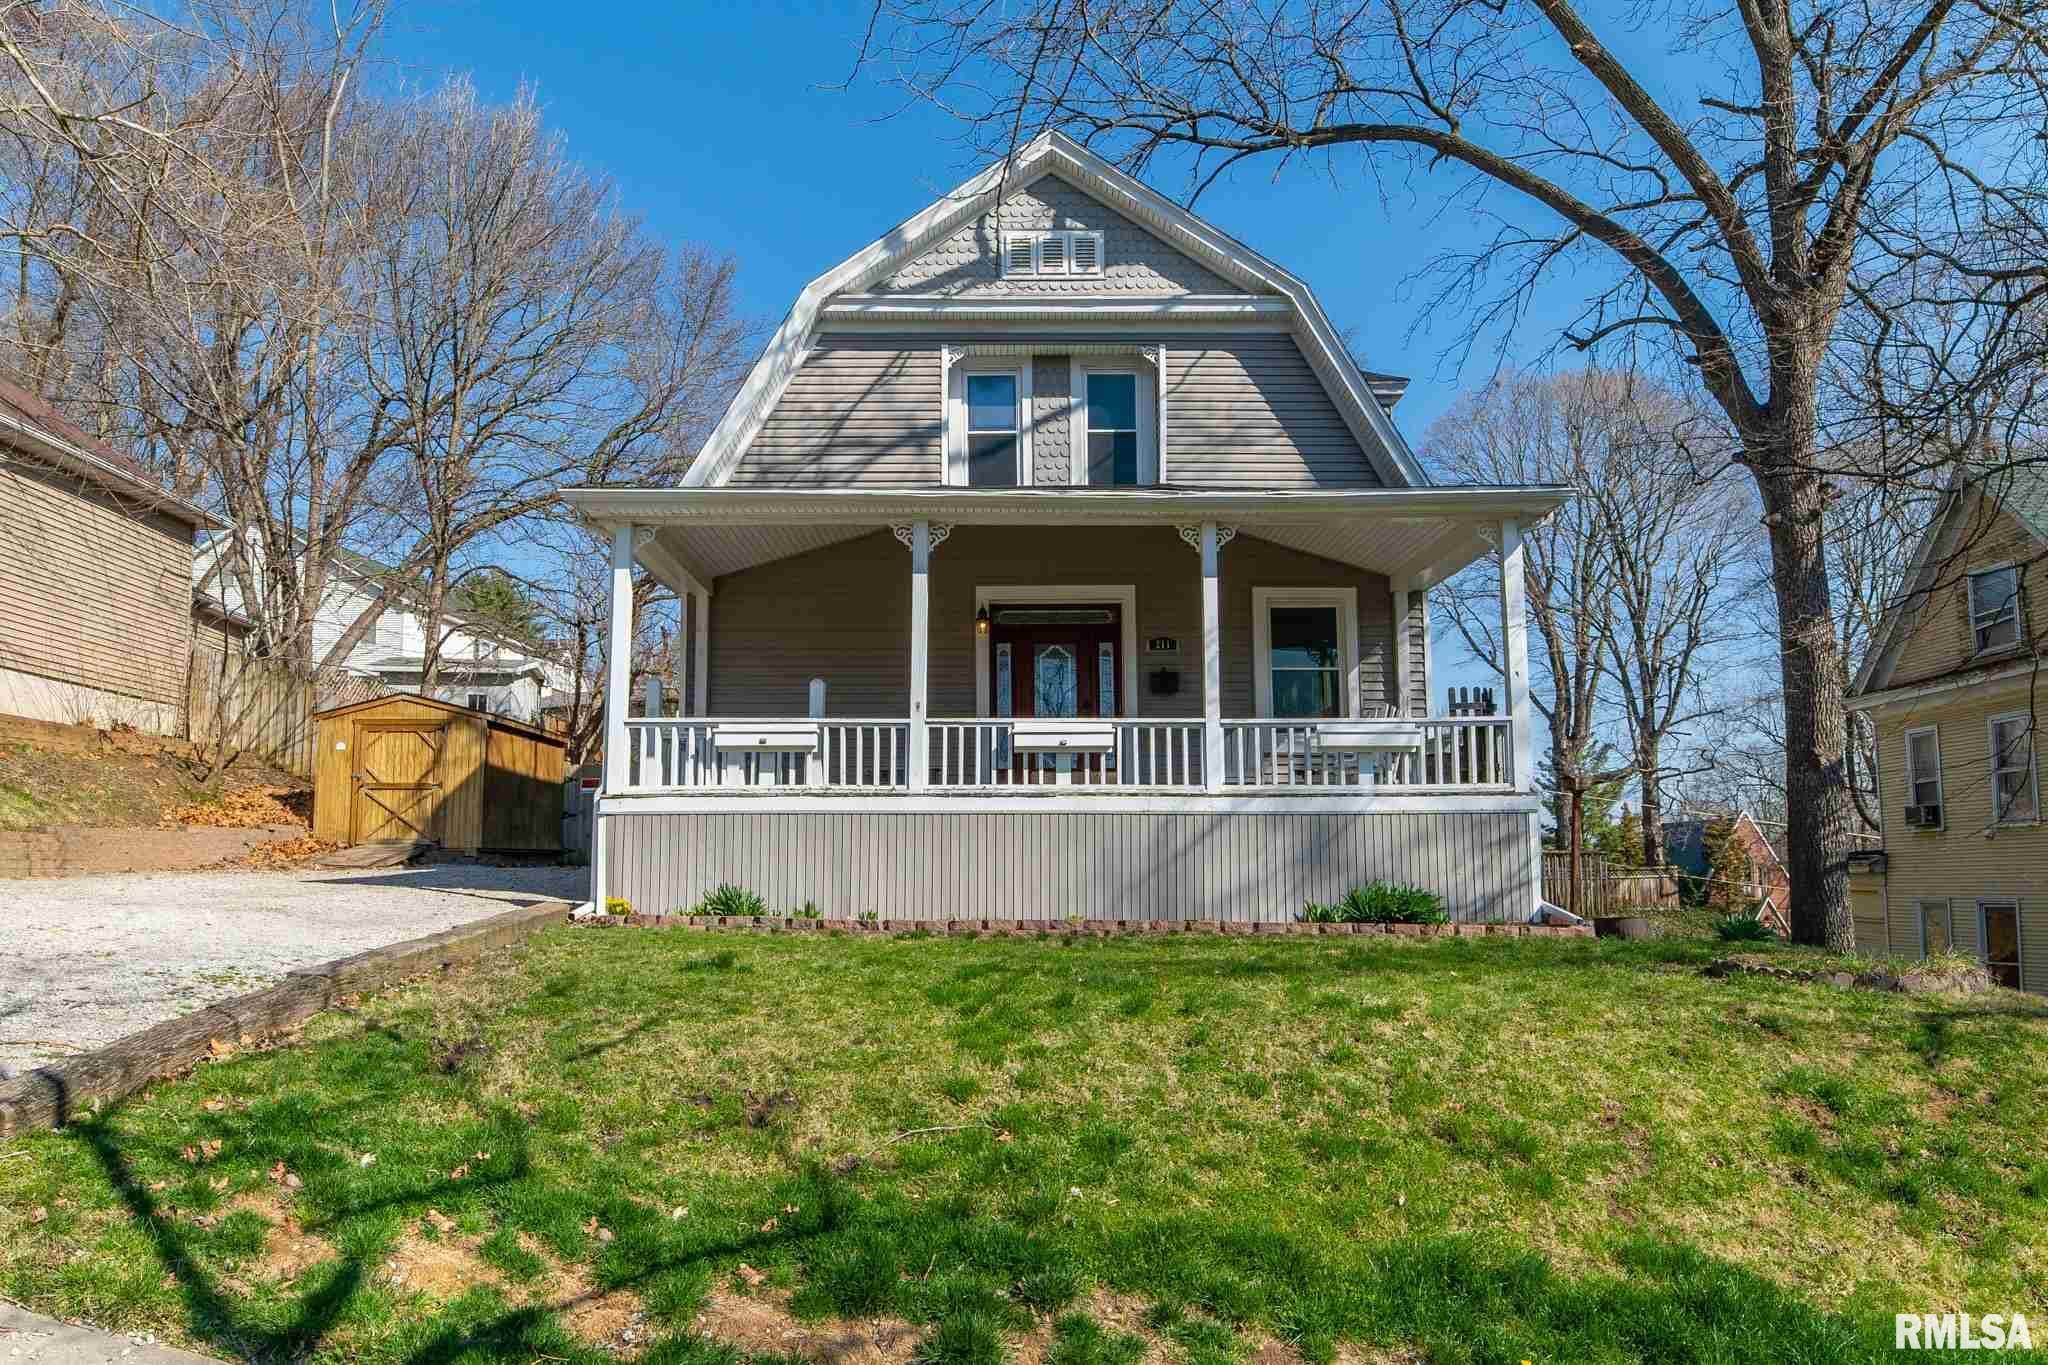 211 W SANGAMON Property Photo - Petersburg, IL real estate listing